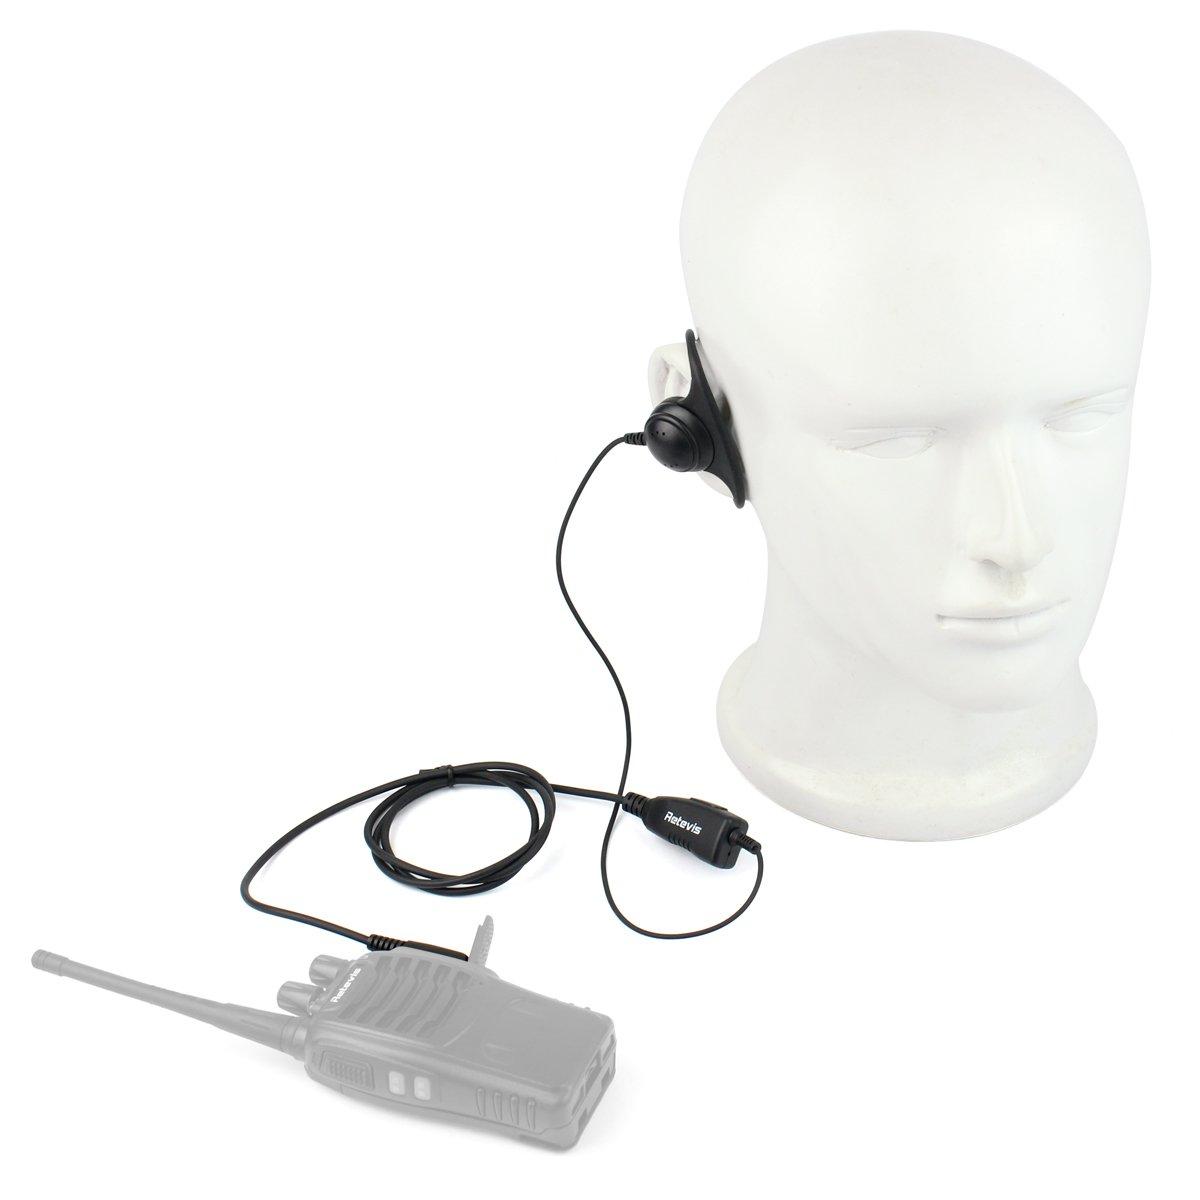 Retevis 2 Pin Walkie Talkies Earpiece D Shape Headset Earpiece for Baofeng UV-5R BF-888S BF-F8HP Retevis H-777 RT21 RT22 RT27 H-777S Kenwood 2 Way Radios (10 Pack) by Retevis (Image #3)